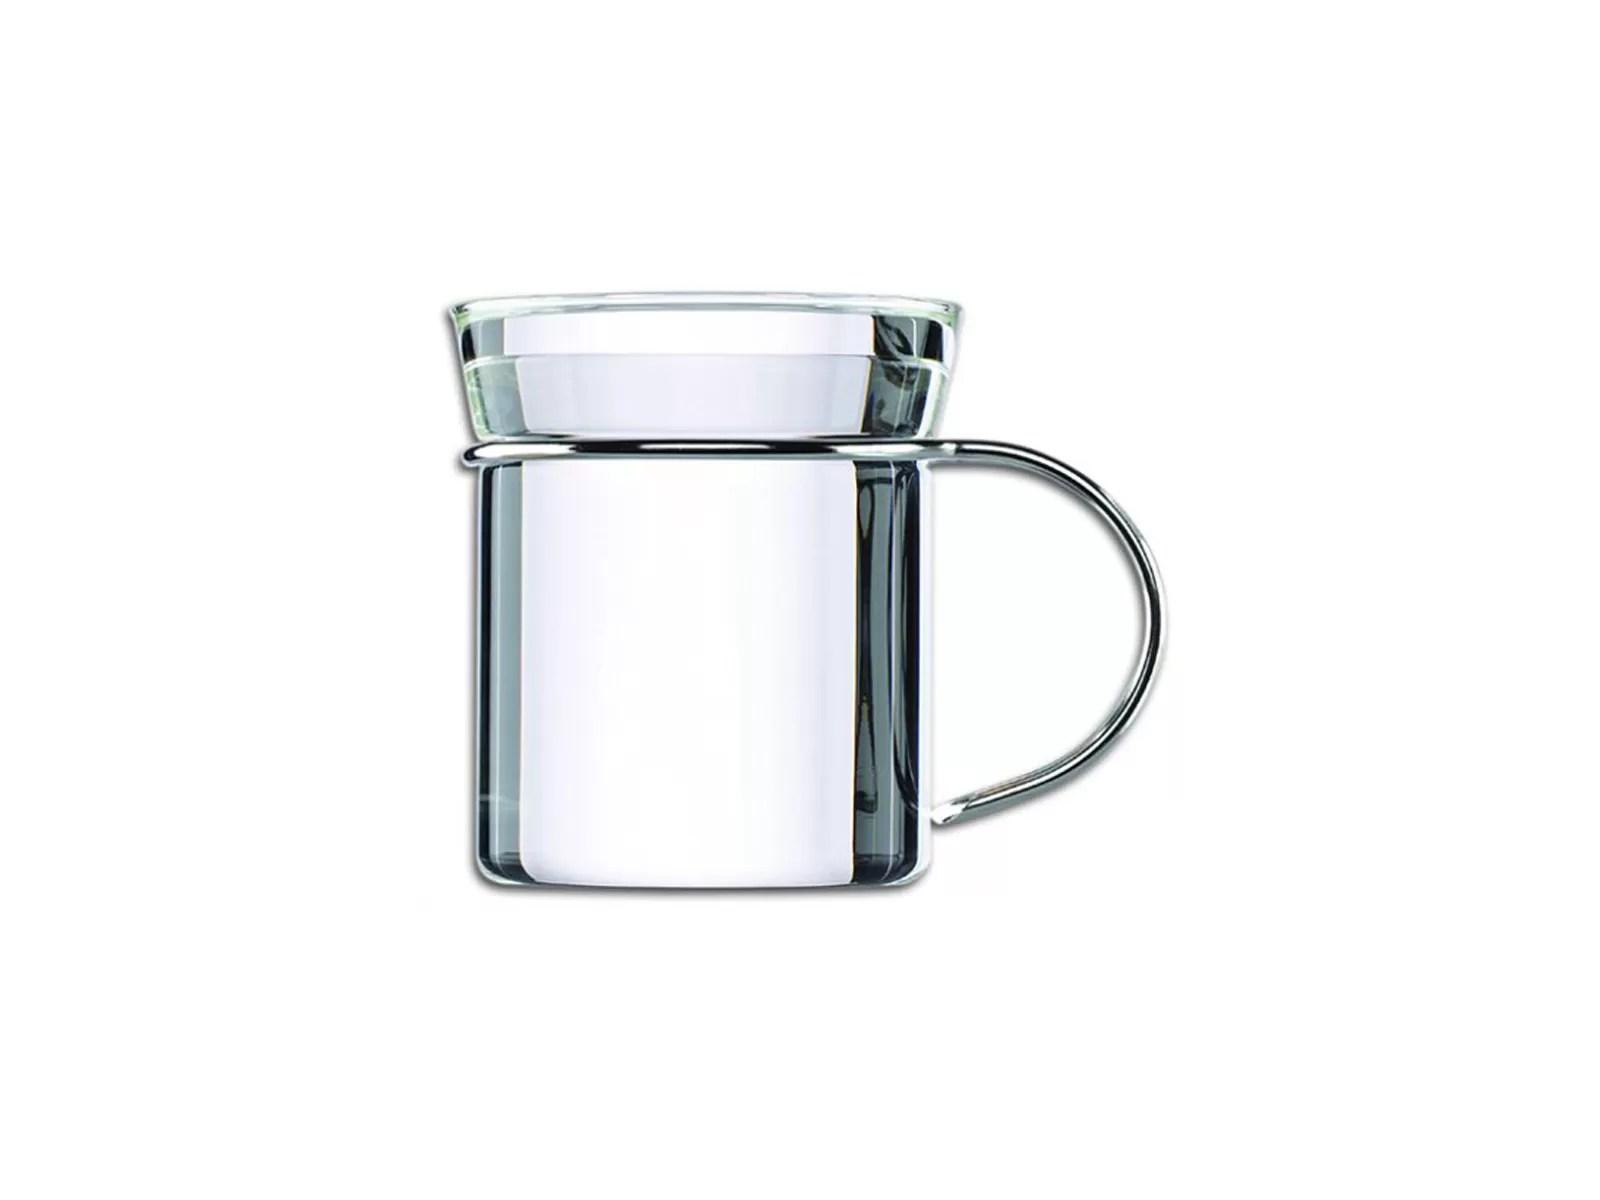 Una selezione di tazze da tè di design, adatte a ogni stile e gusto